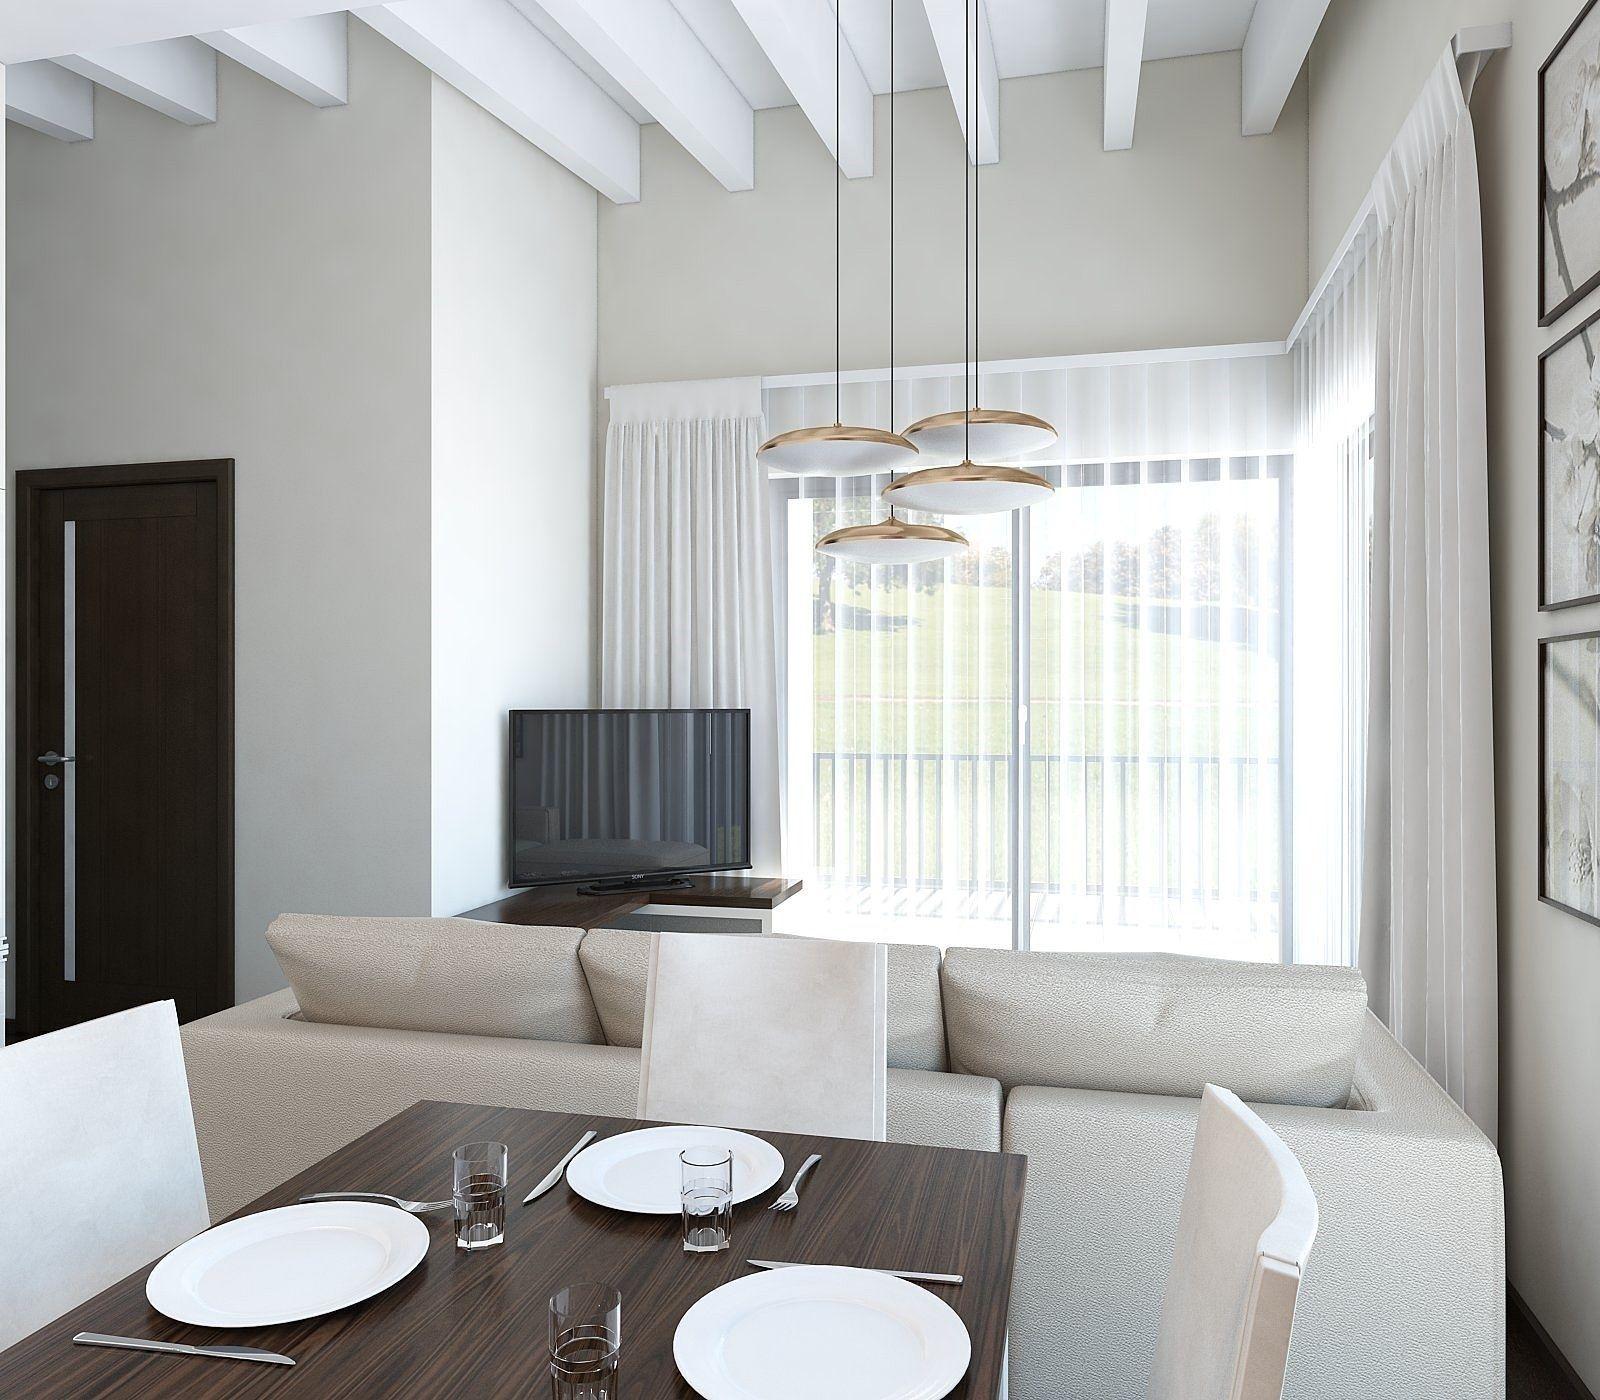 ... Nice Living Room 3d Model Max Obj 3ds Fbx Skp 2 ... Part 96